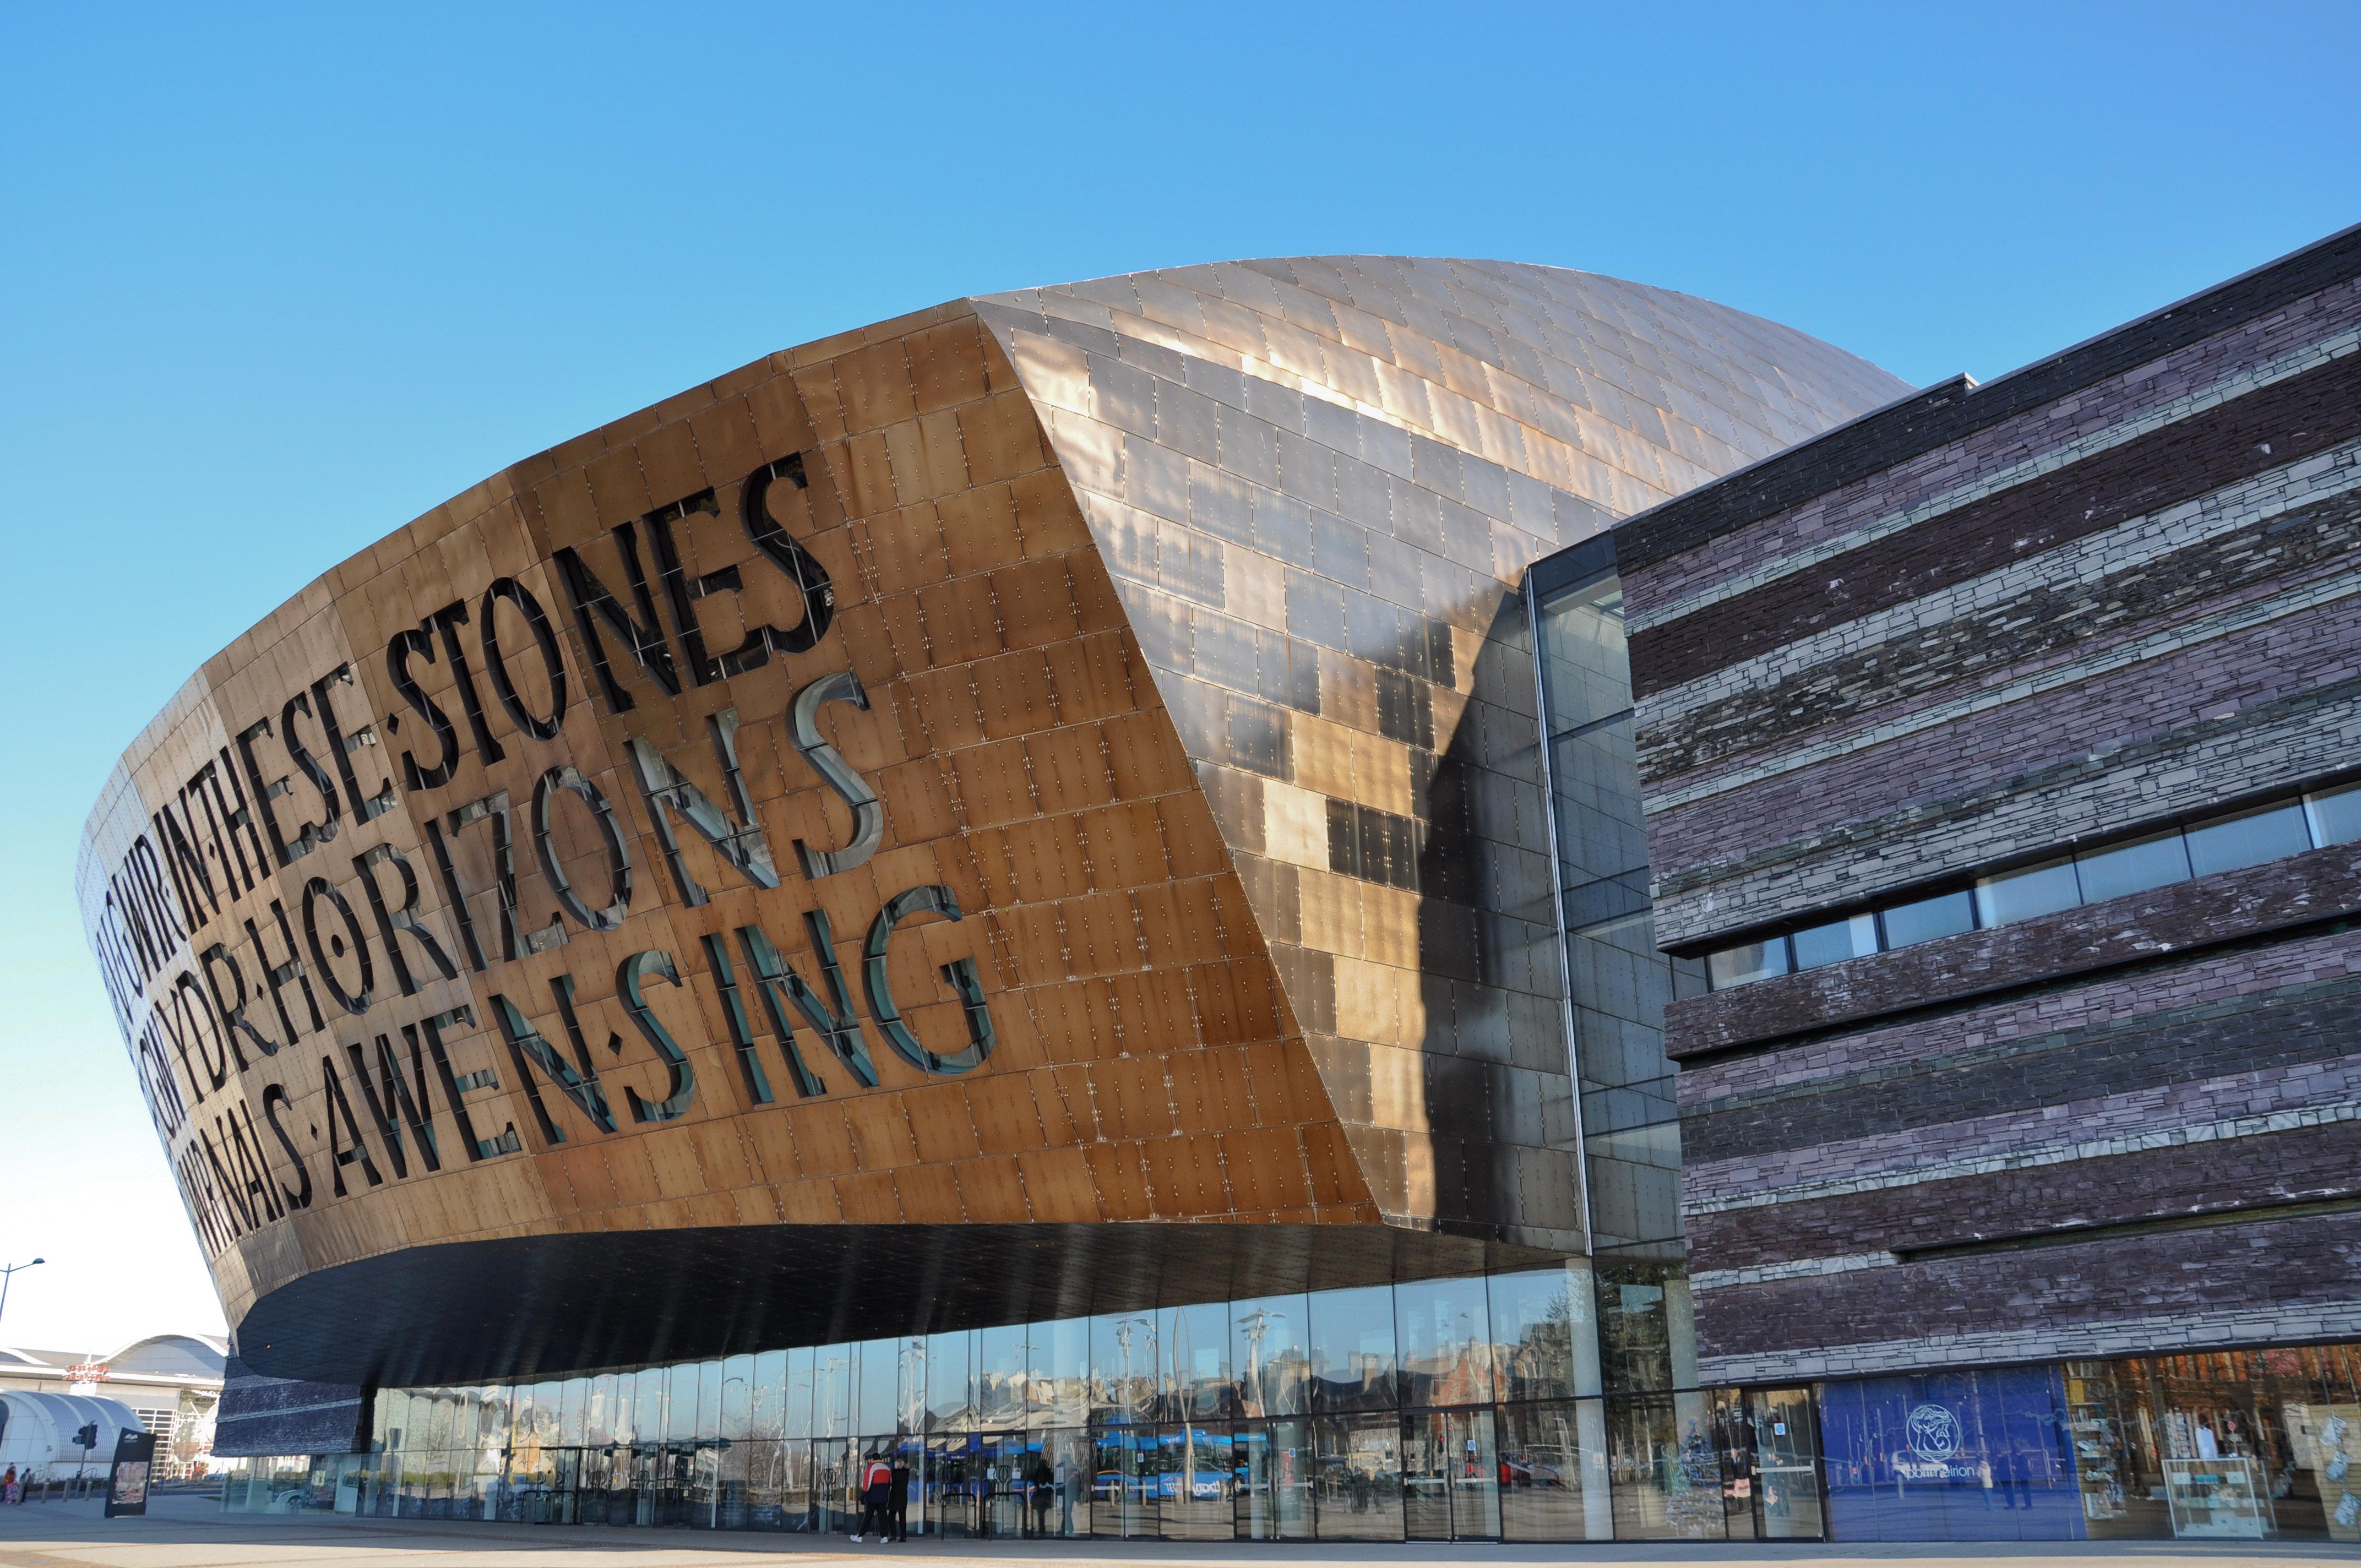 File:Millennium Centre, Cardiff Bay.jpg | Familypedia ...